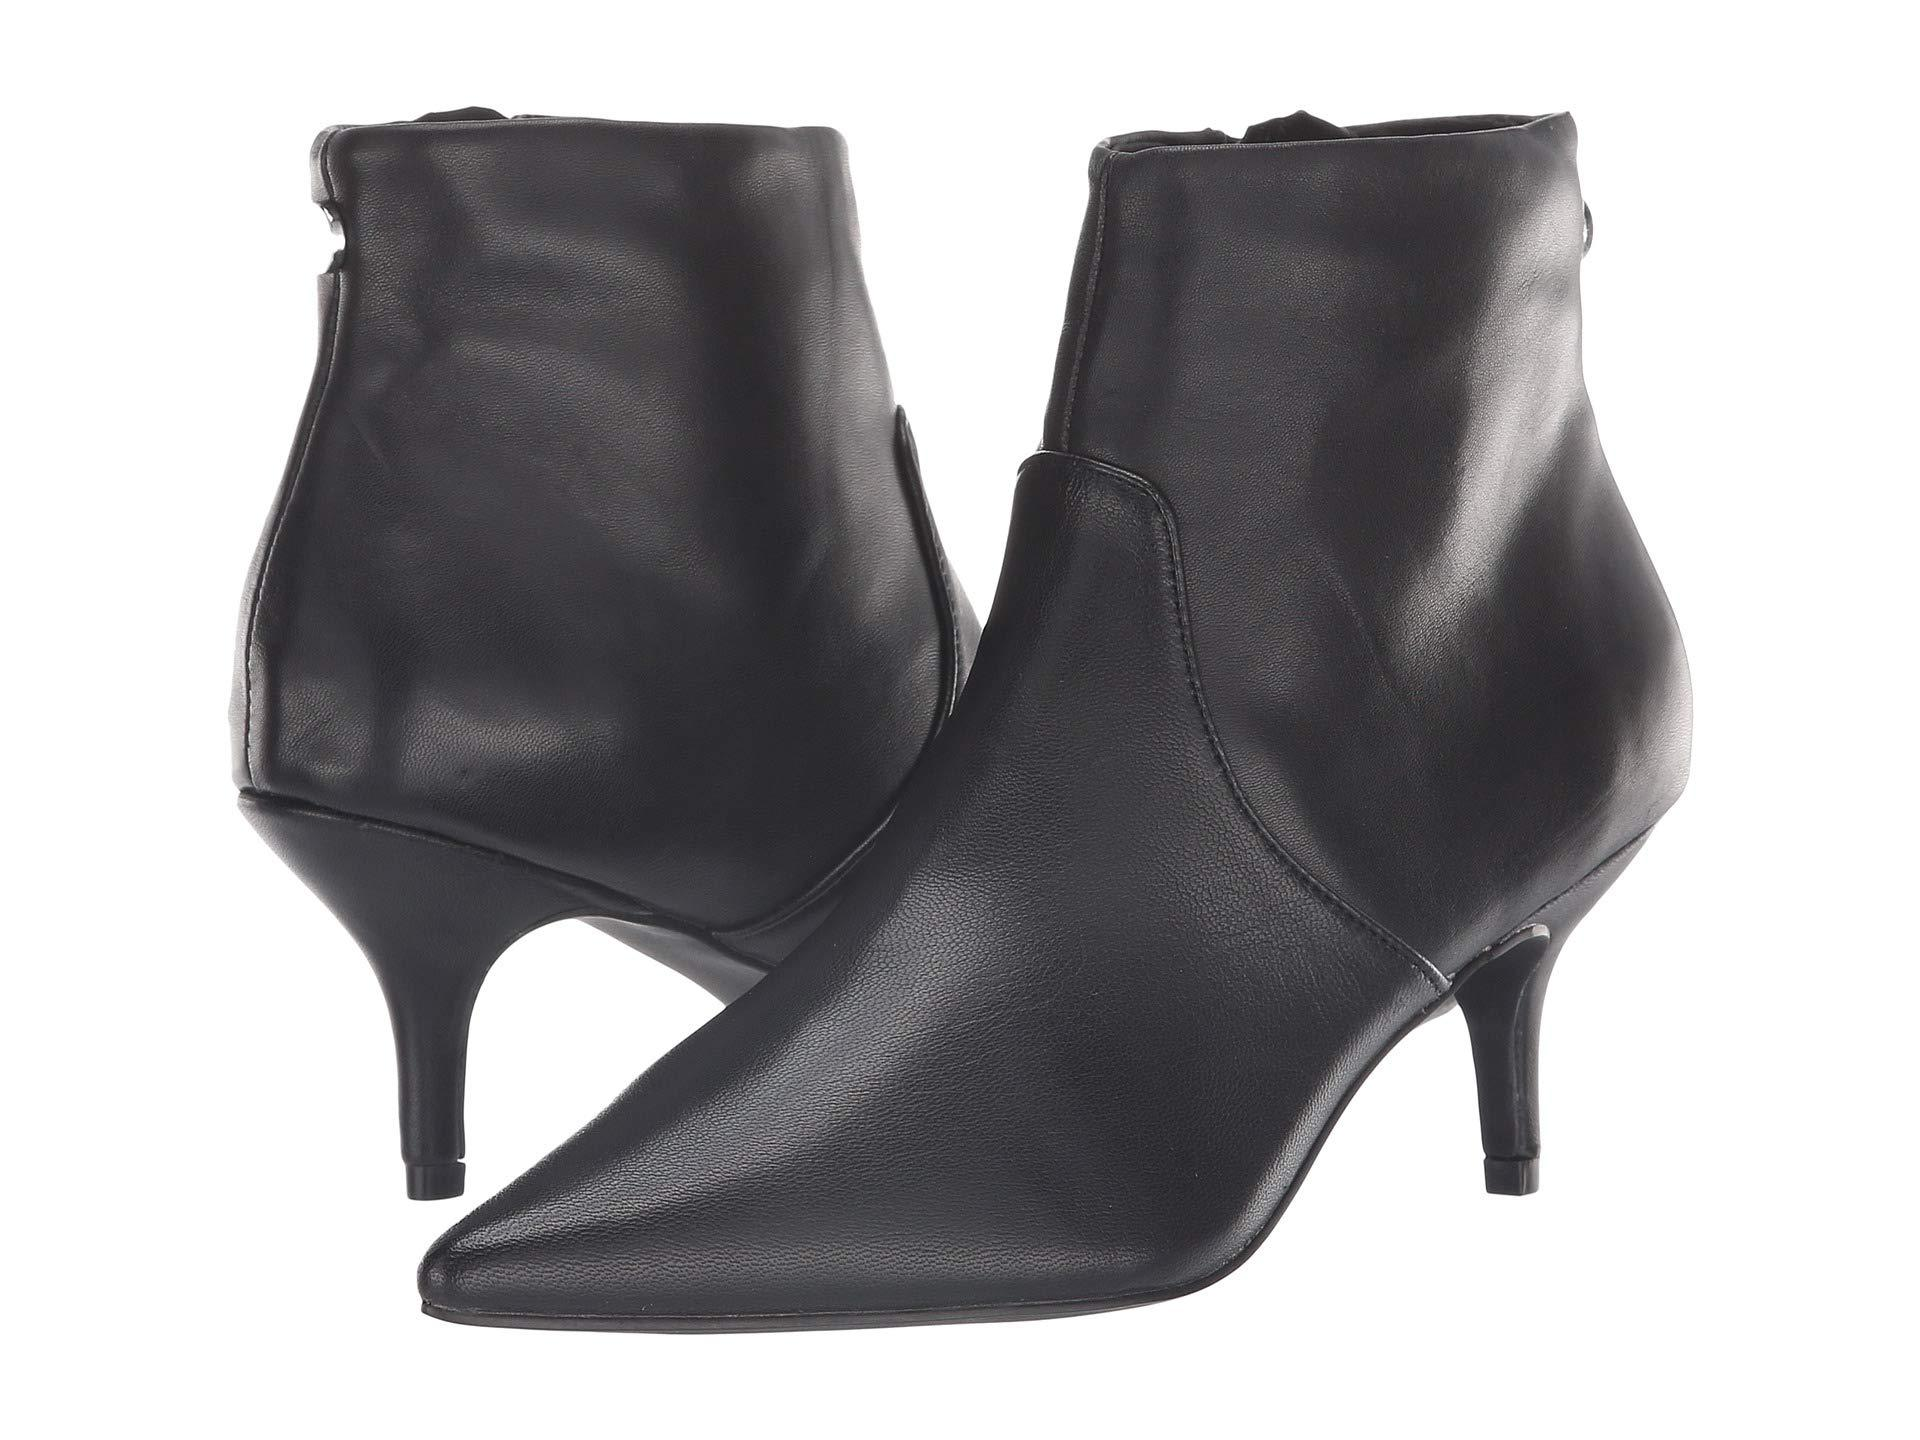 c3e24467052 Lyst - Steve Madden Rome Dress Bootie in Black - Save 30%